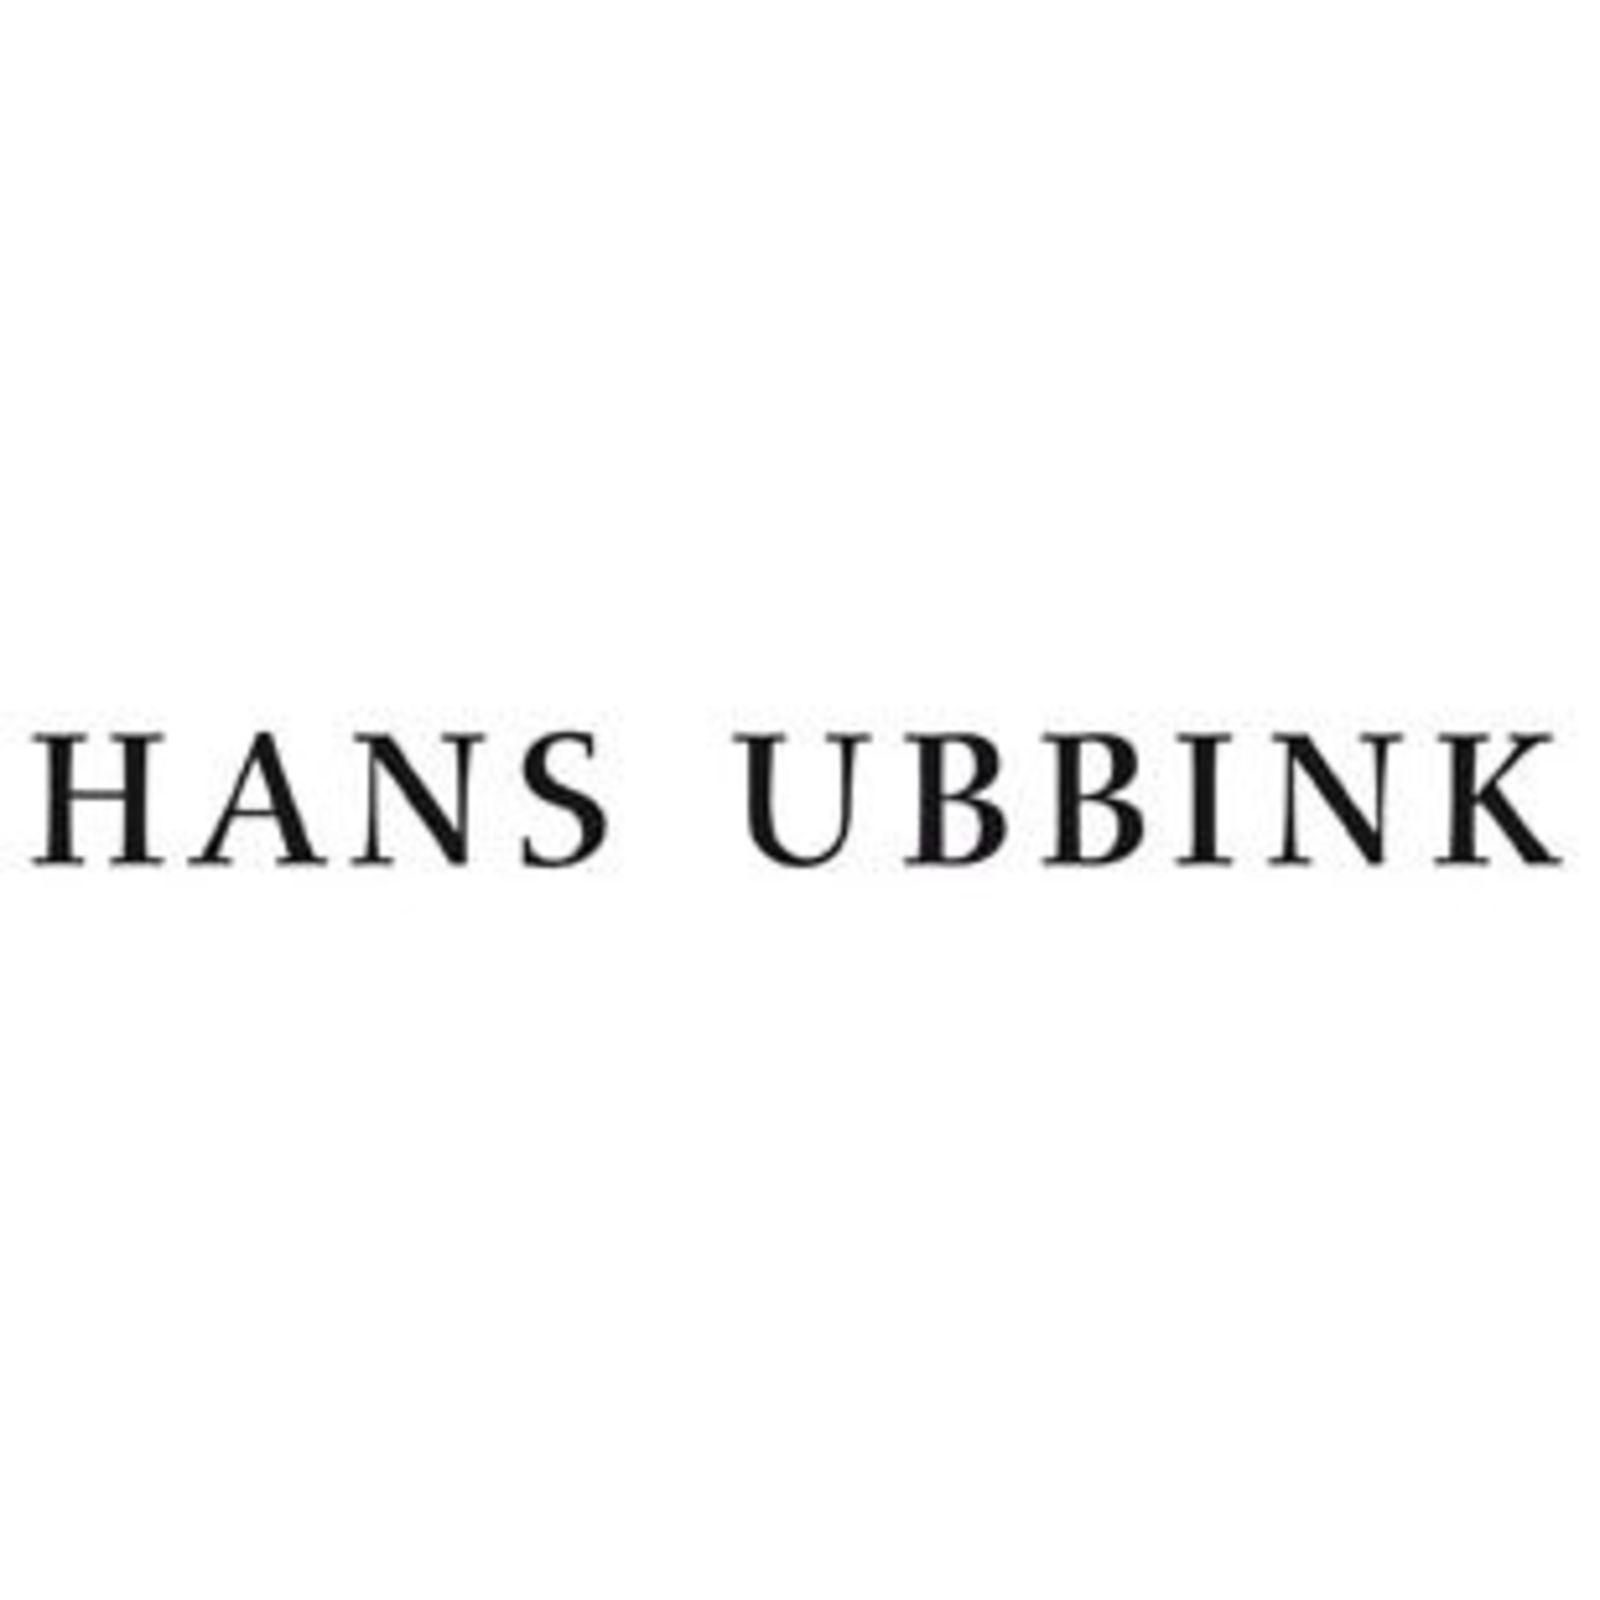 HANS UBBINK